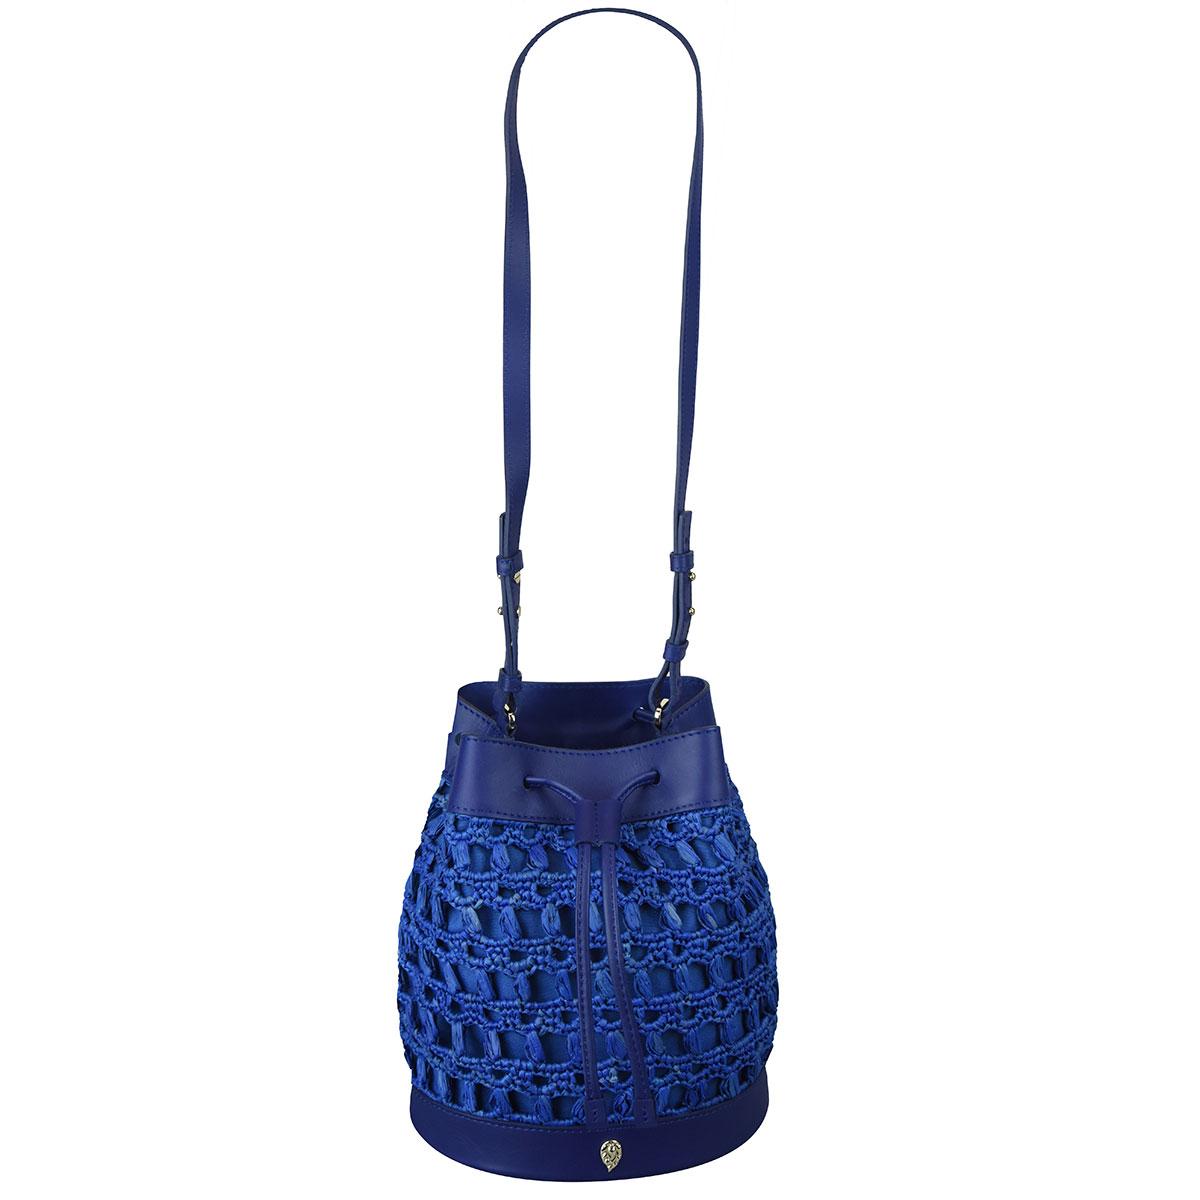 Helen Kaminski Barbados Bucket Bag in Cobalt,Regent